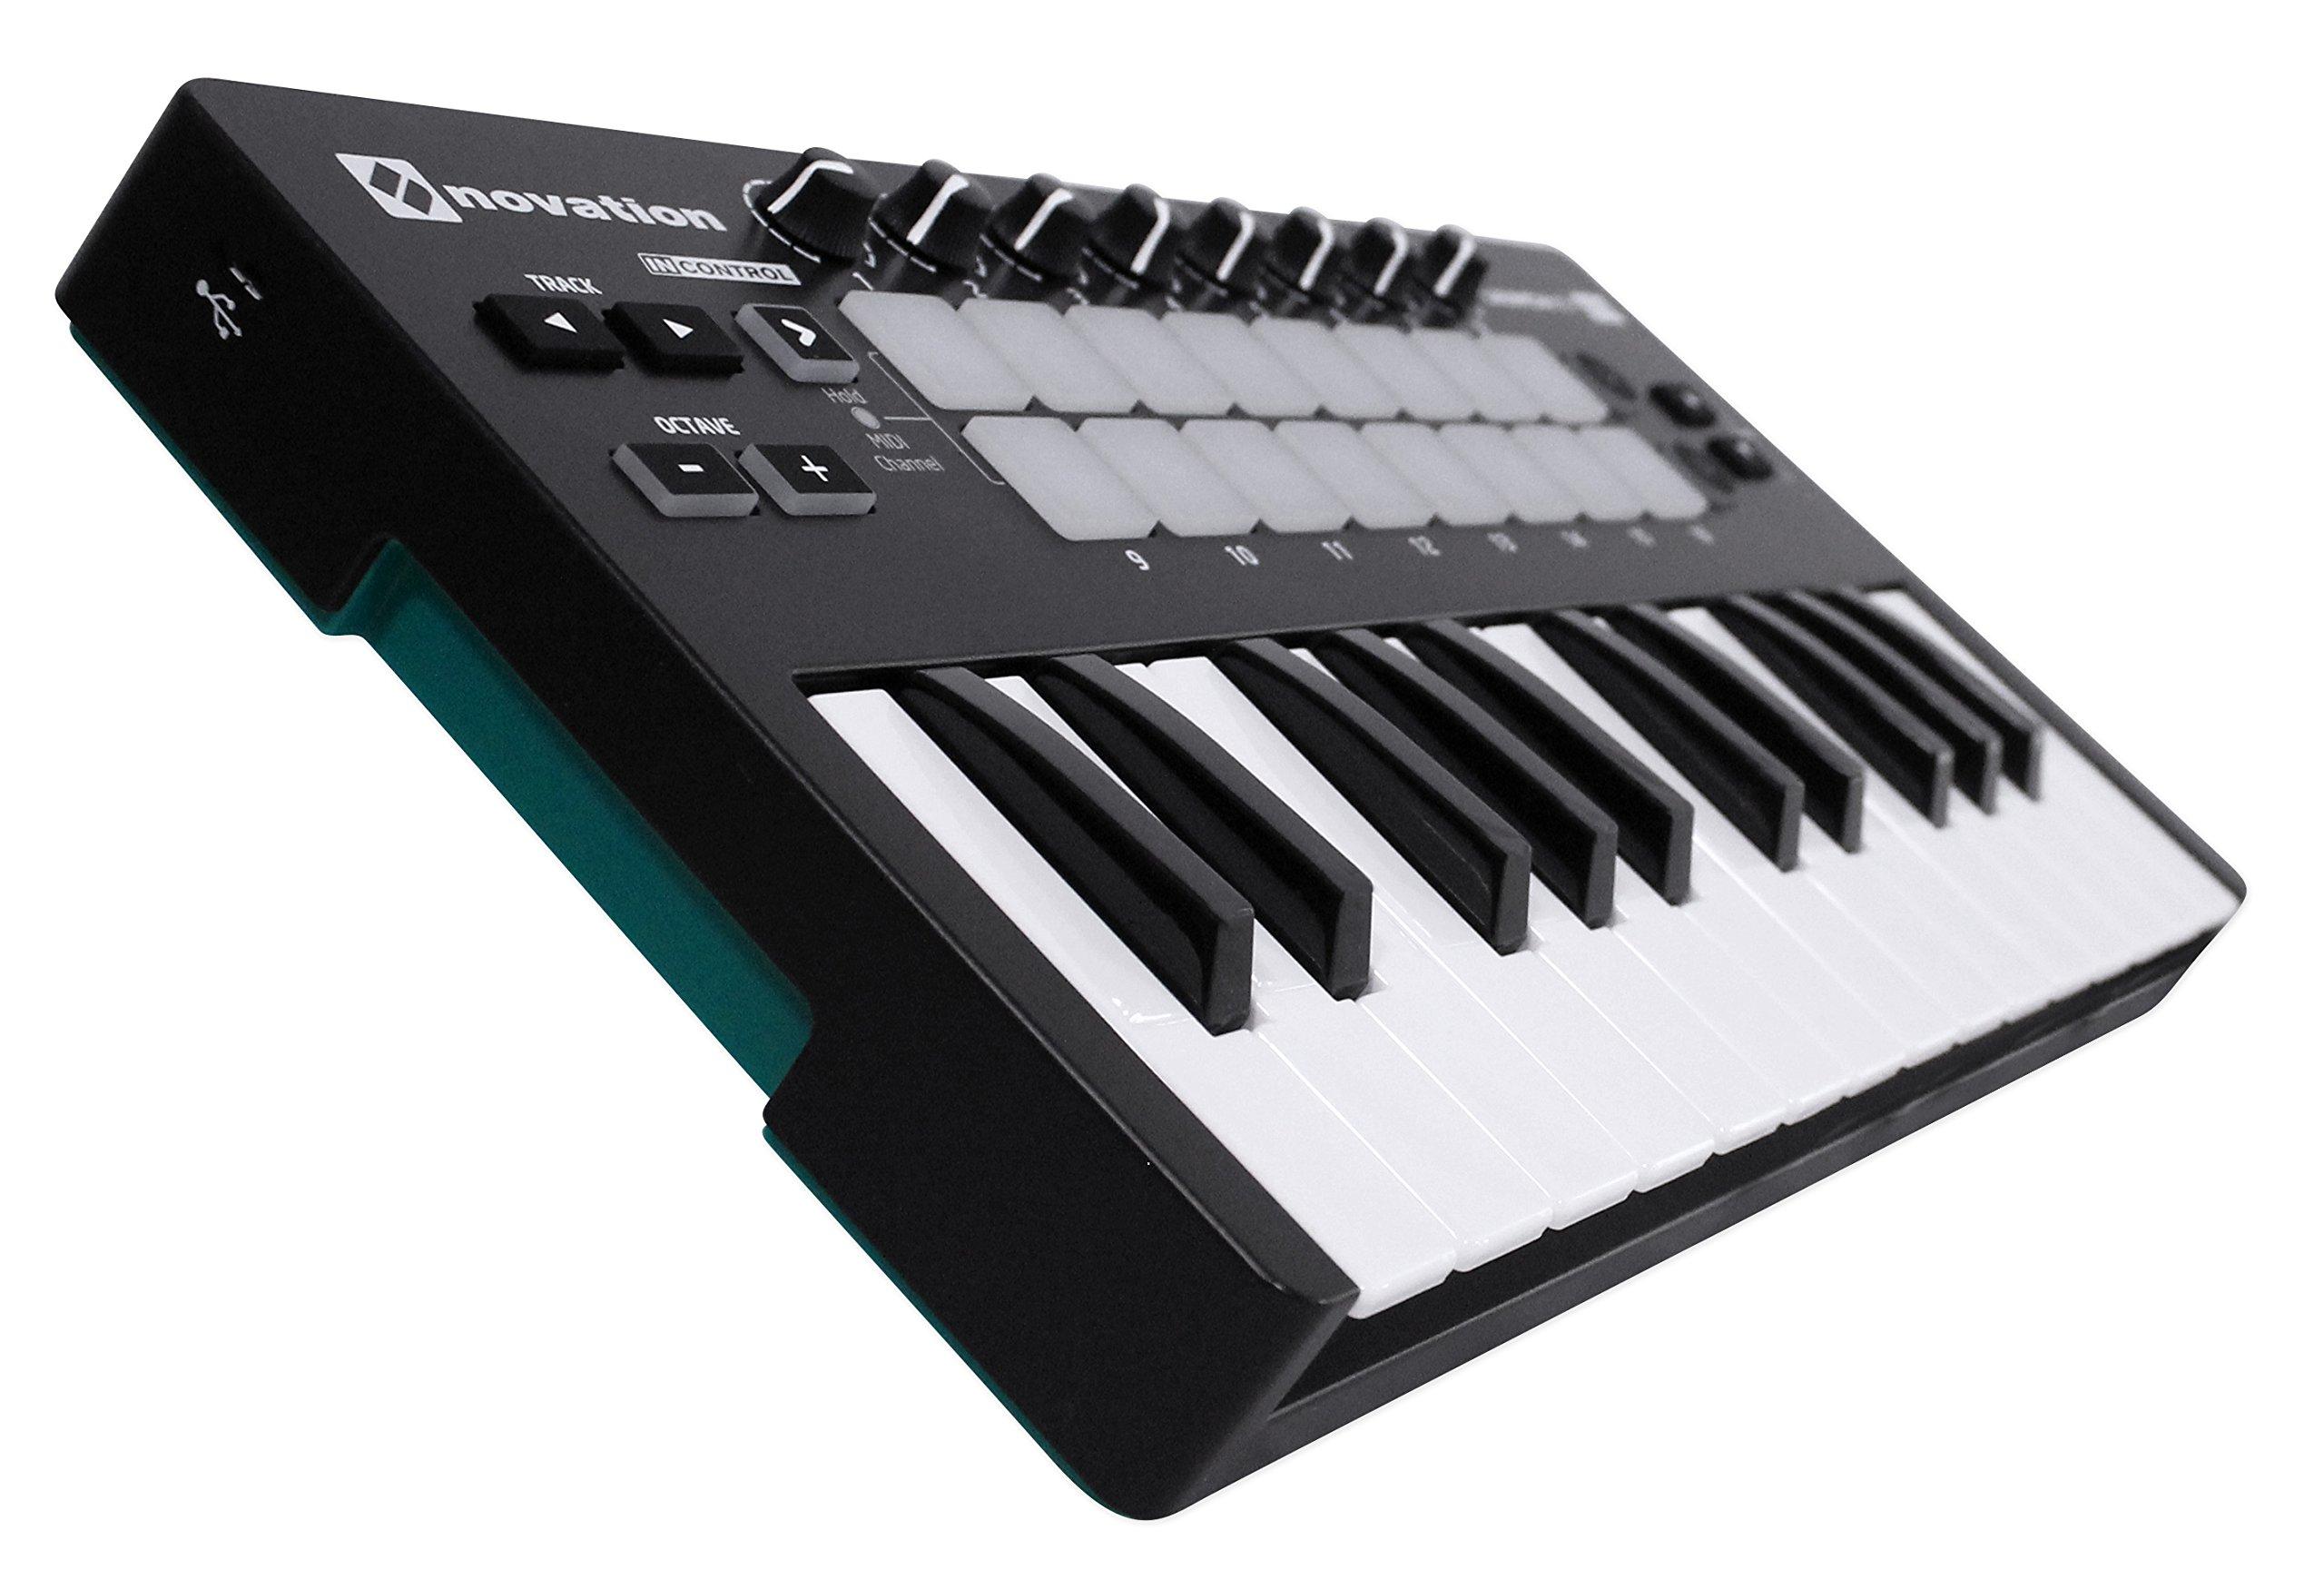 Novation LAUNCHKEY MINI MK2 25 Key USB Keyboard Controller+Bluetooth Speaker by Nov (Image #2)